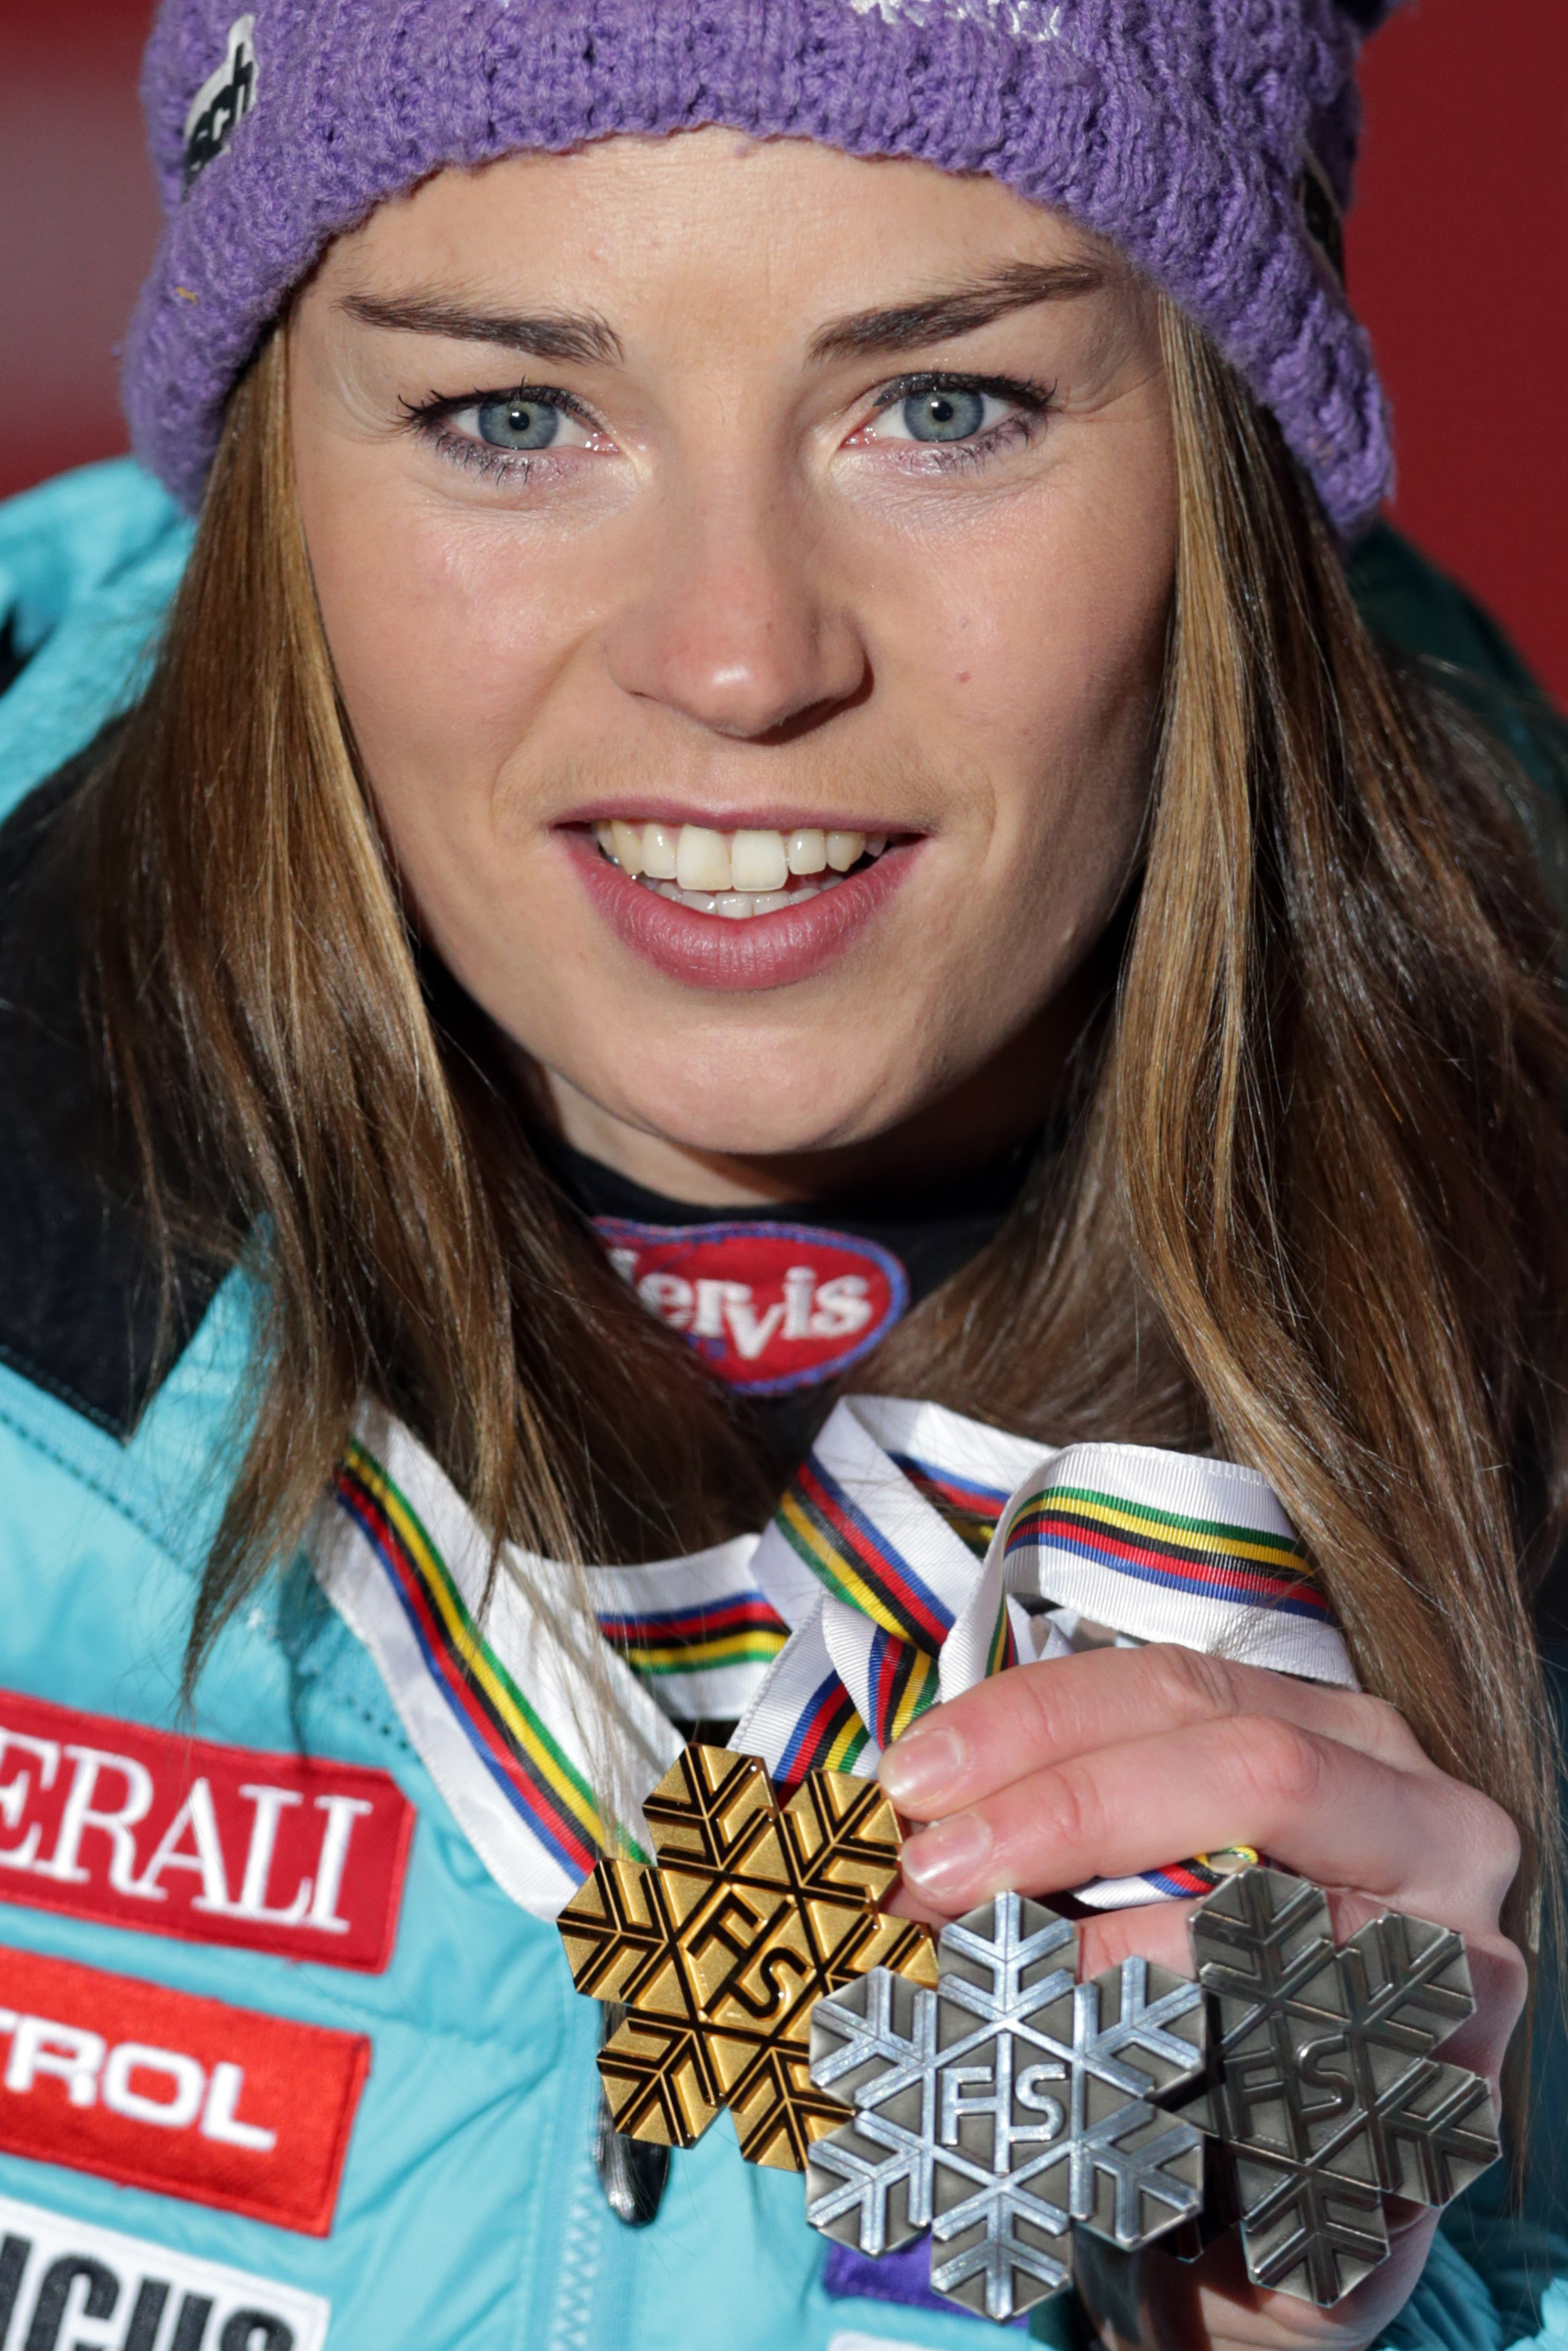 tina maze 2014 winter olympics olympic athletes sochi russia espn